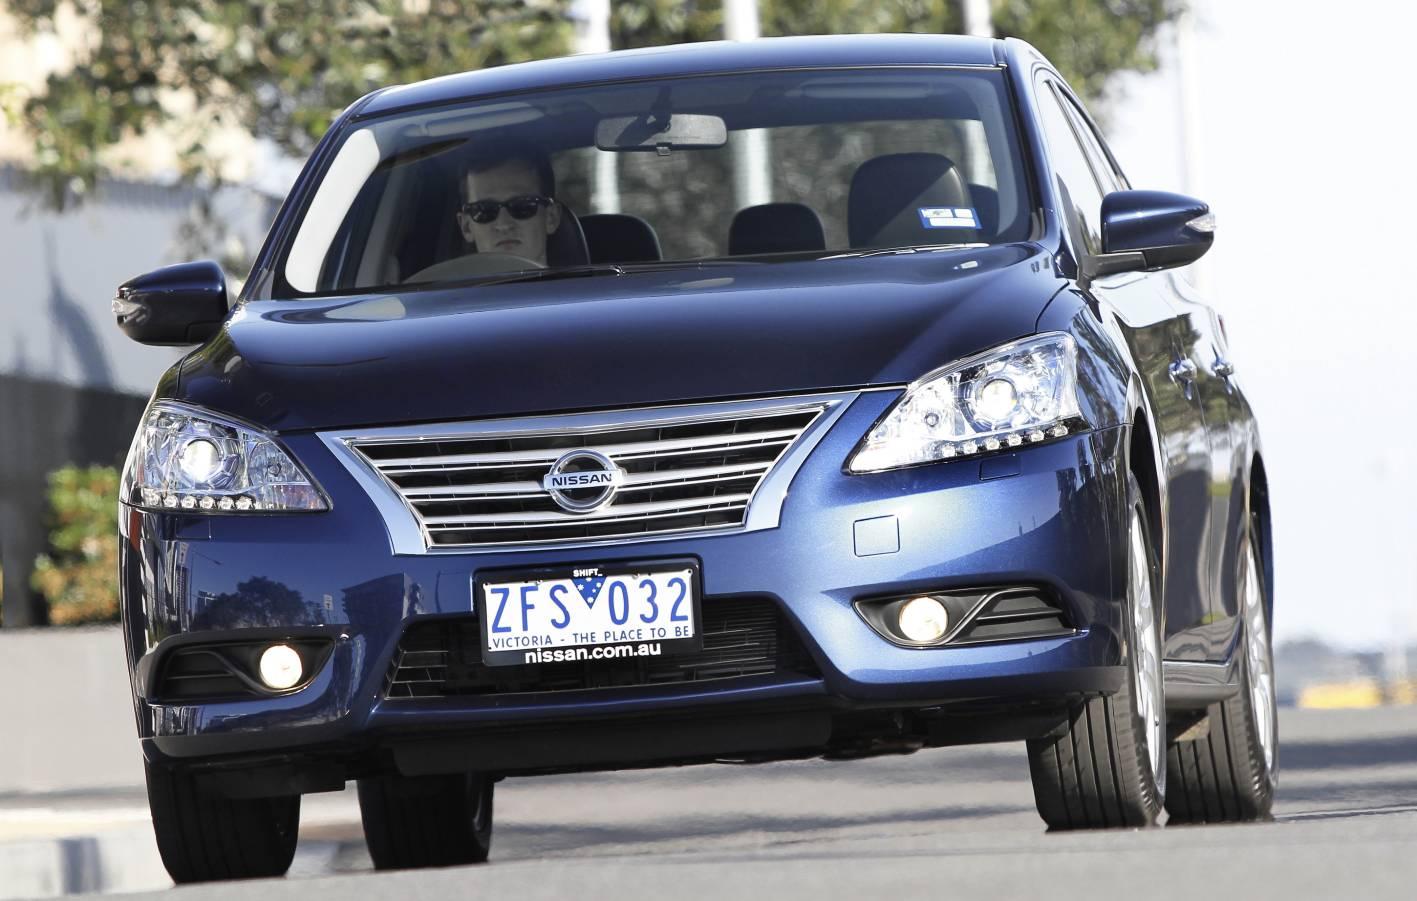 Nissan Pulsar on verge of market comeback - photos | CarAdvice